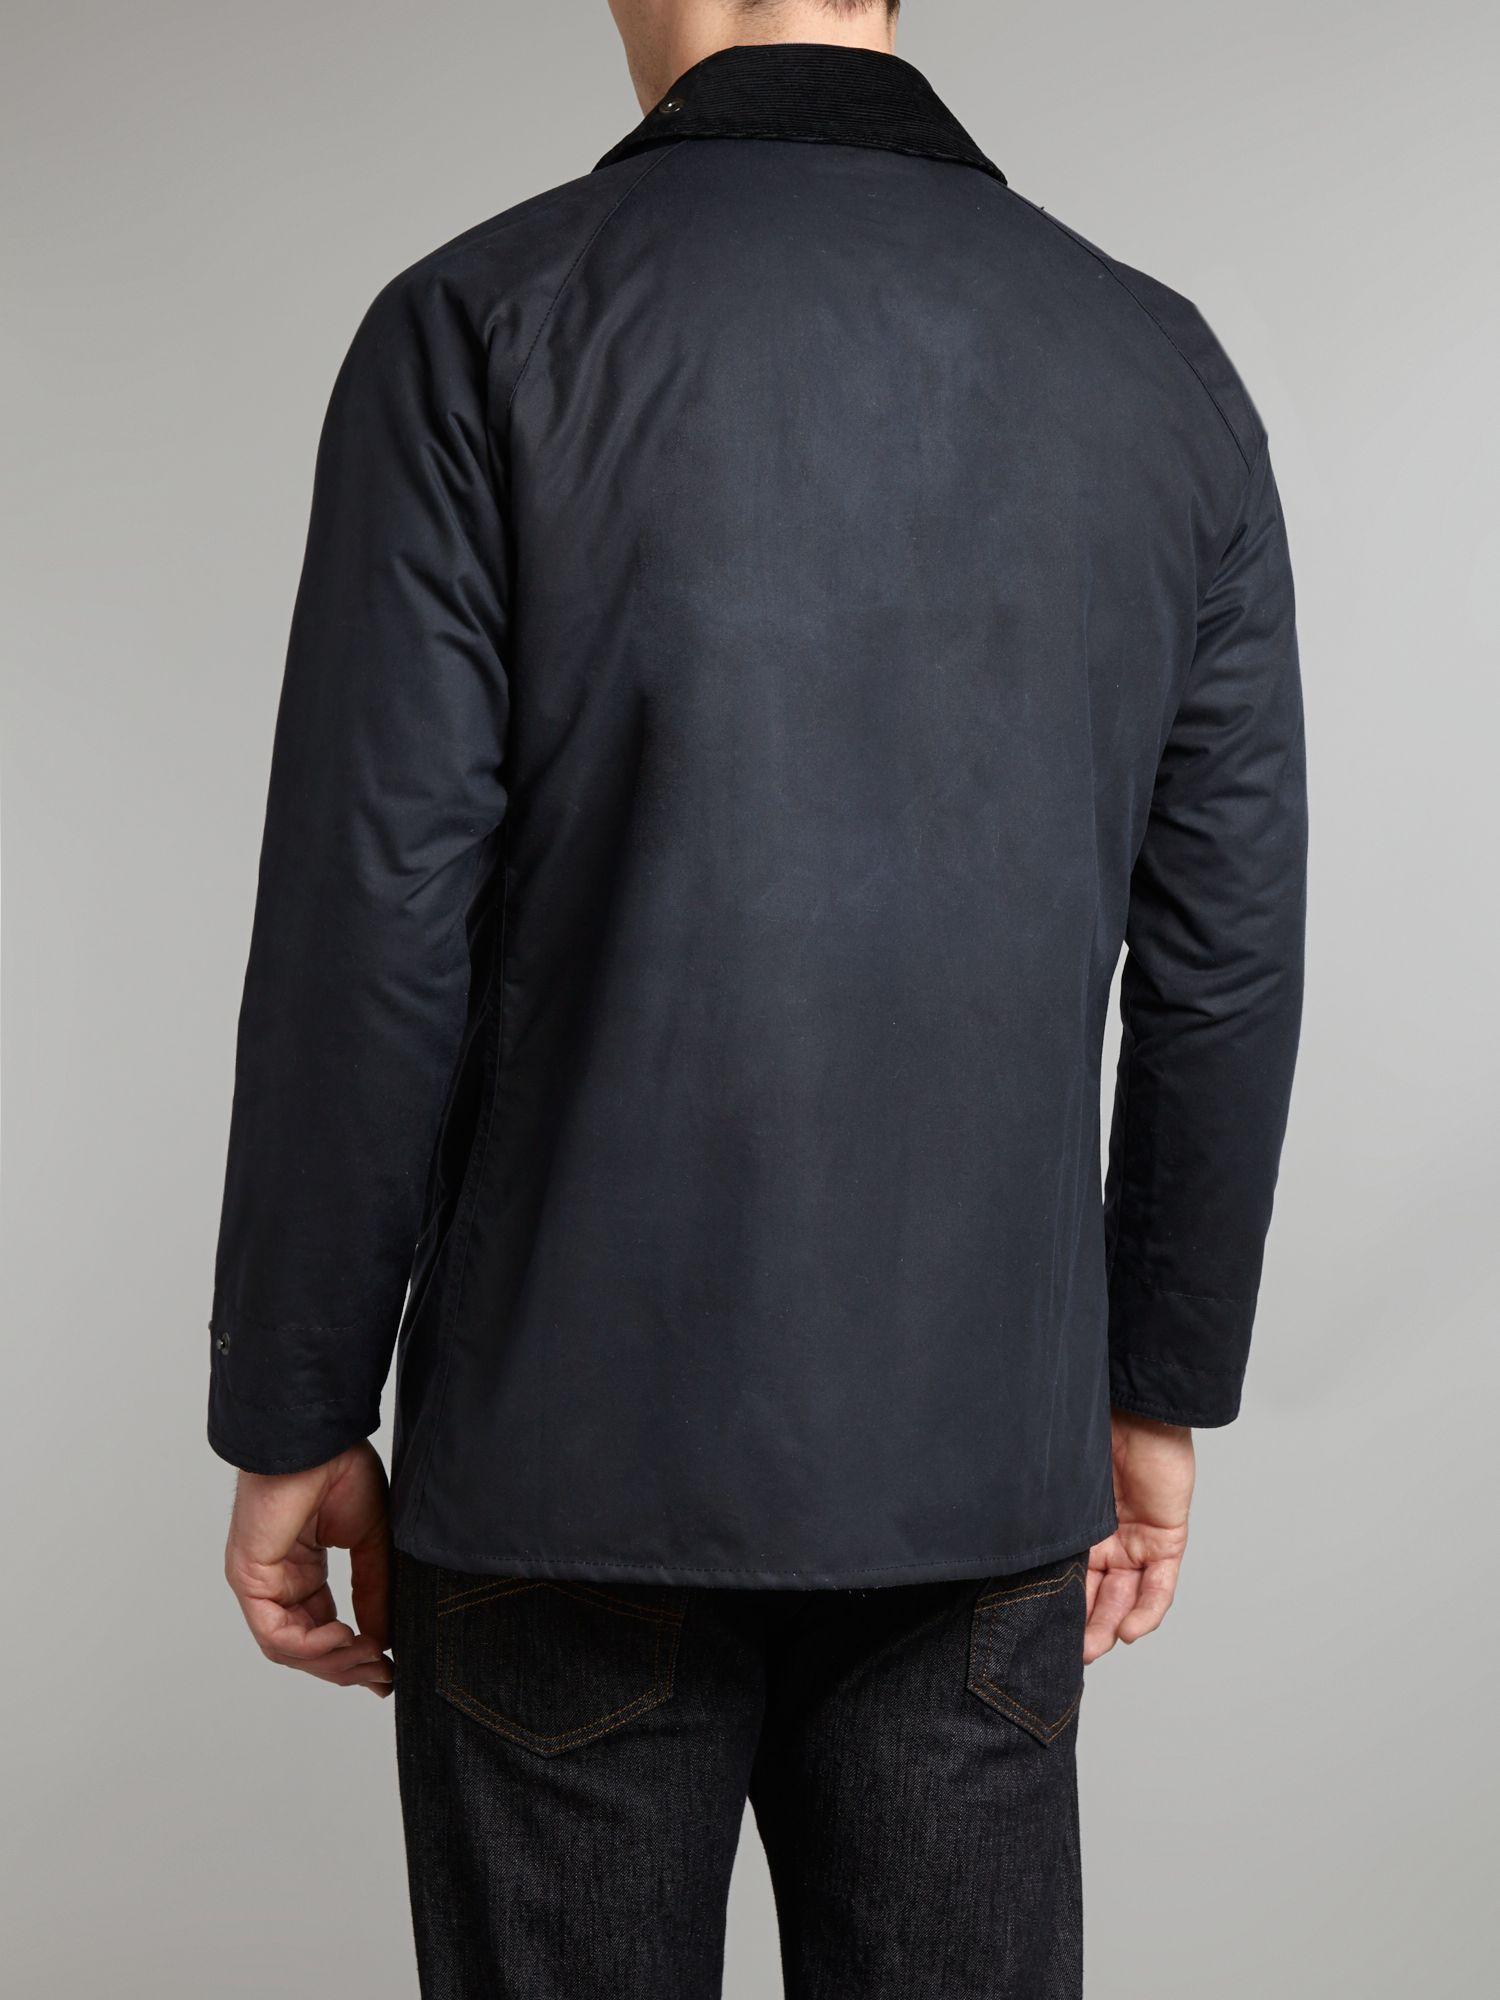 Barbour Wax Transport Jacket In Blue For Men Lyst